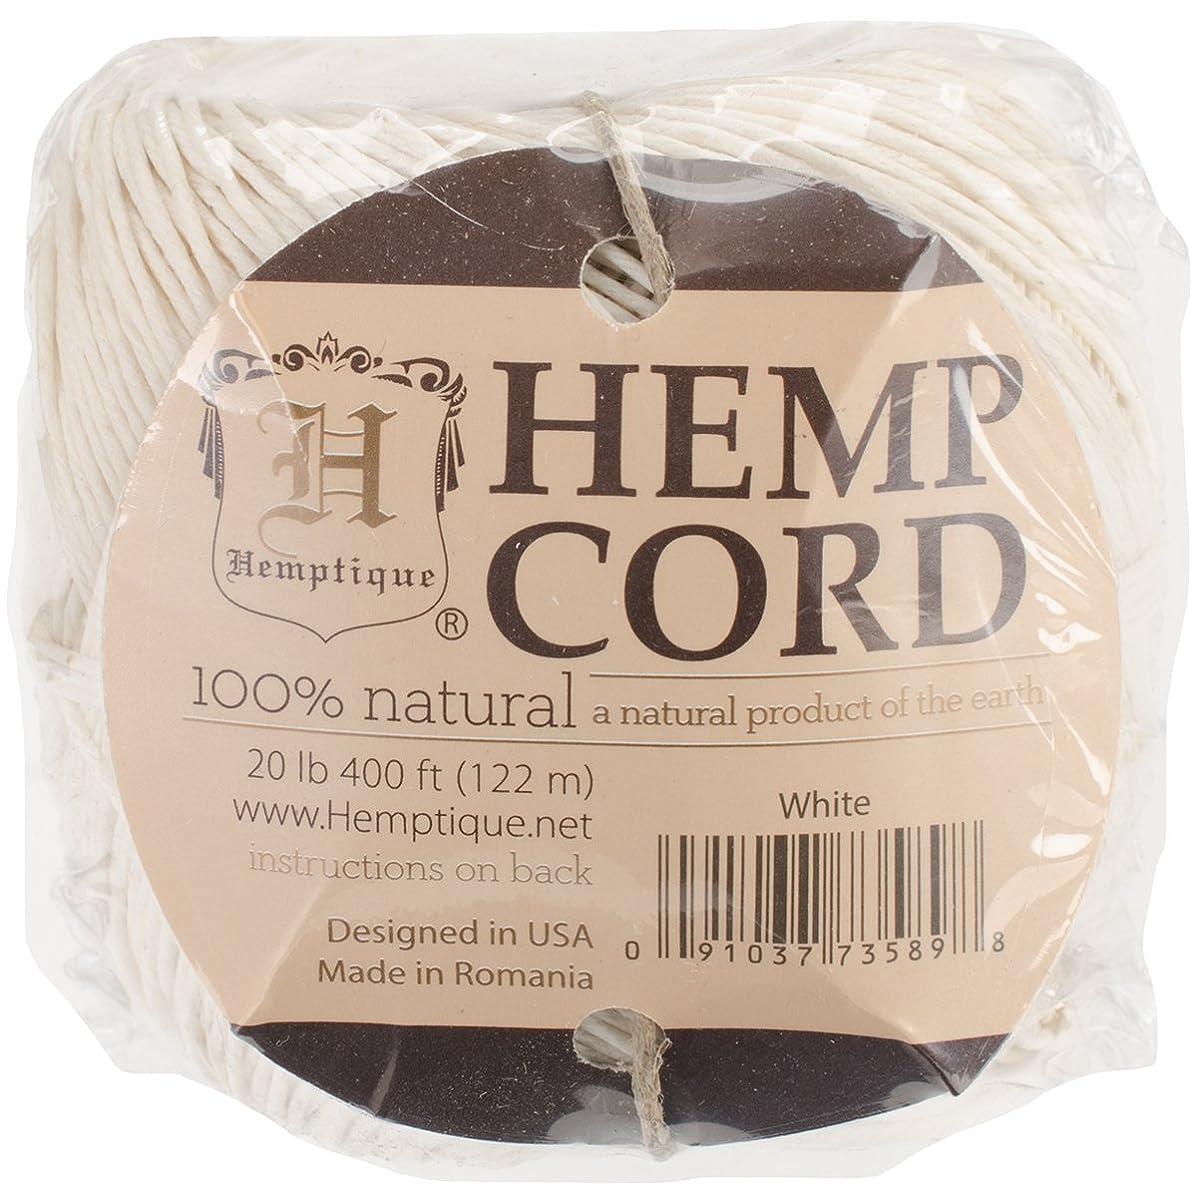 Hemptique Hemp Ball, 400', White